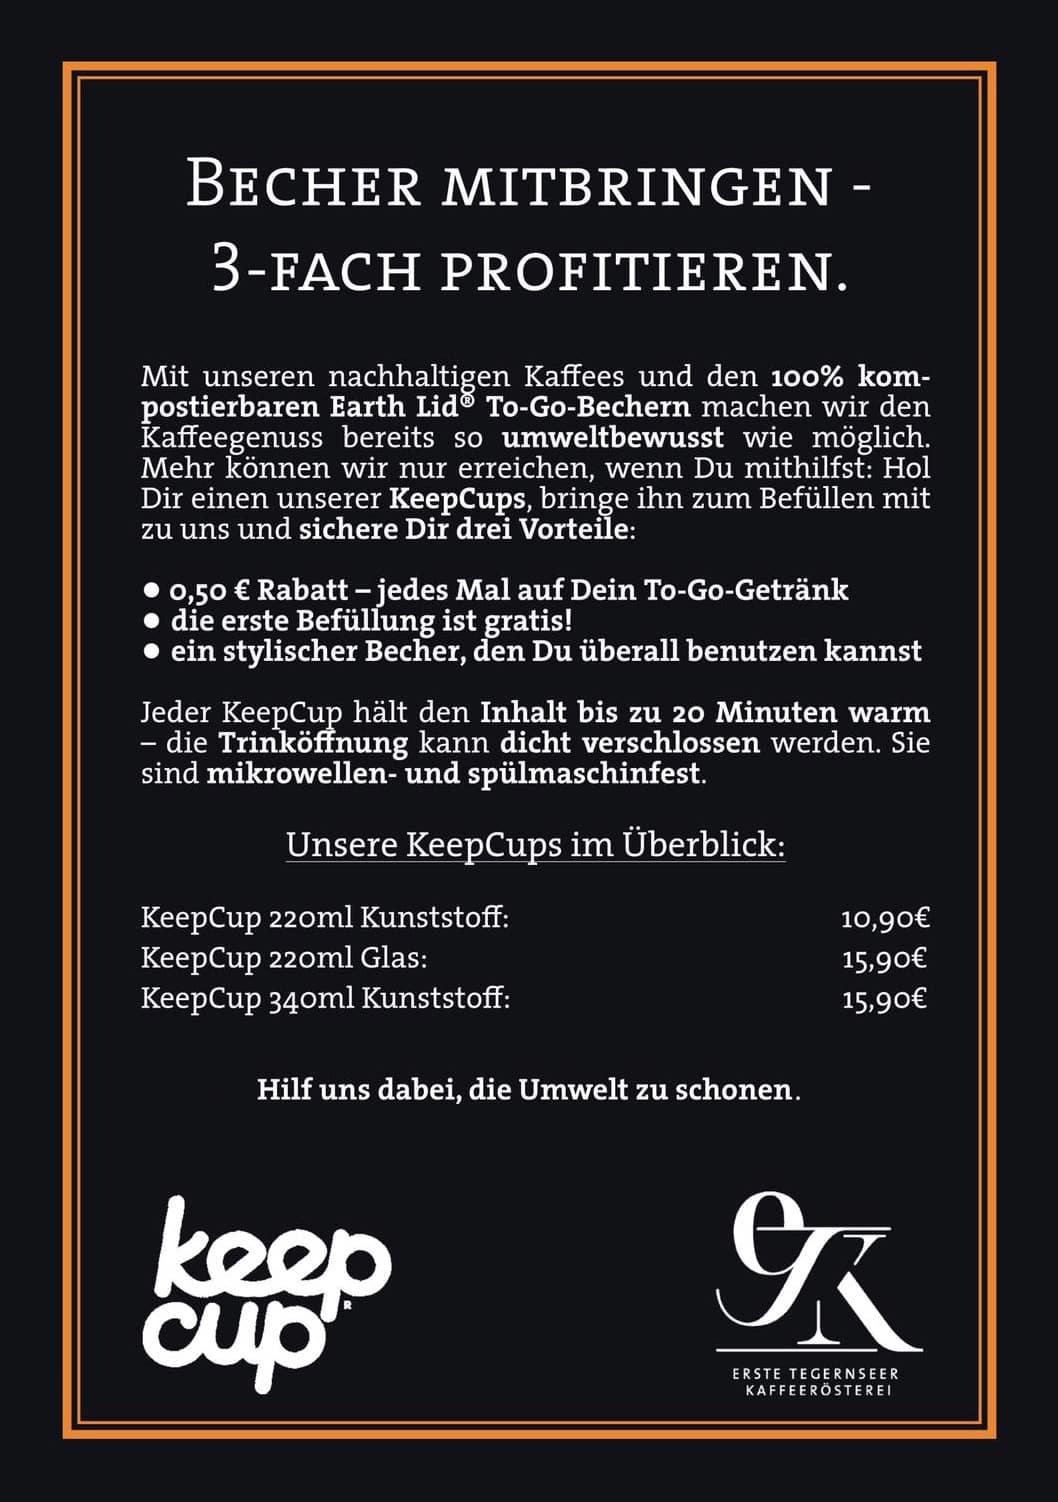 keepcup-info